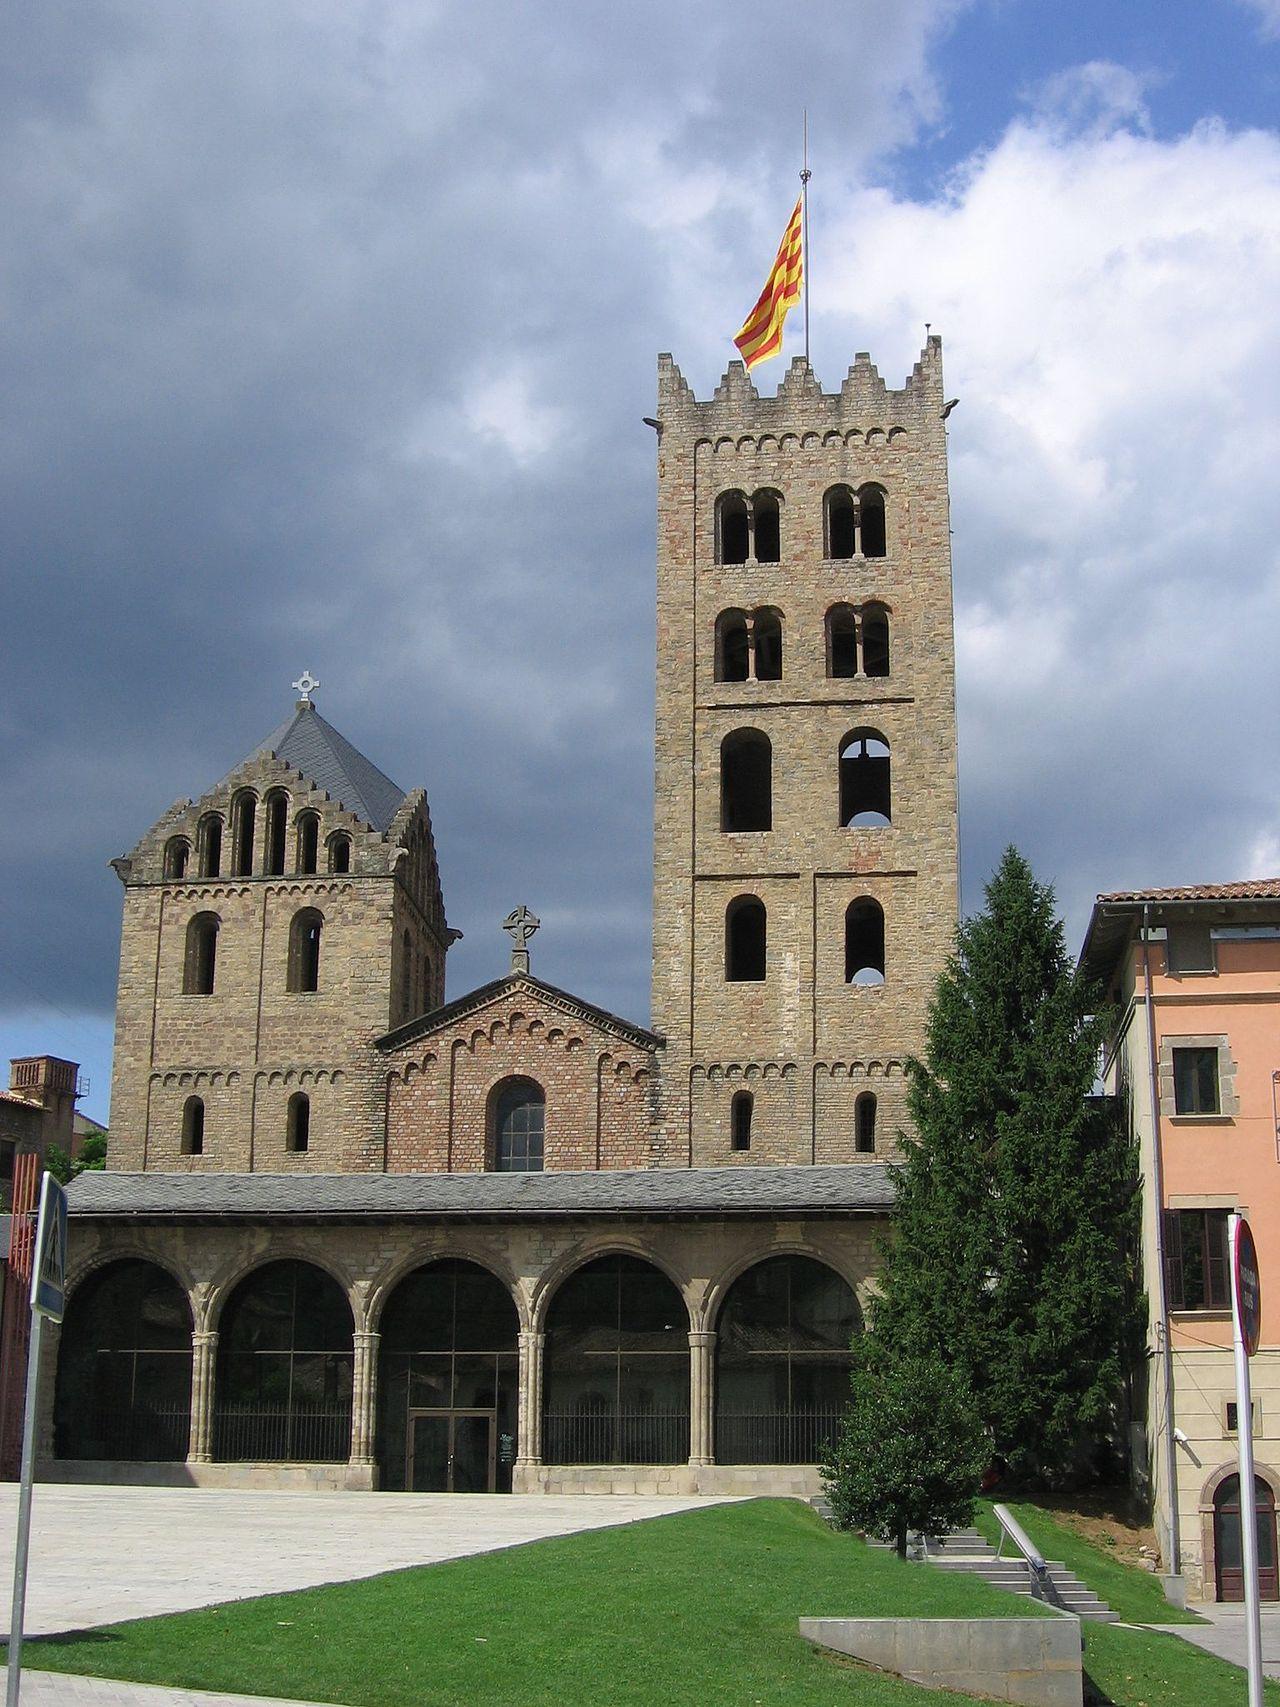 CATHOLIC MONASTERY, SPAIN